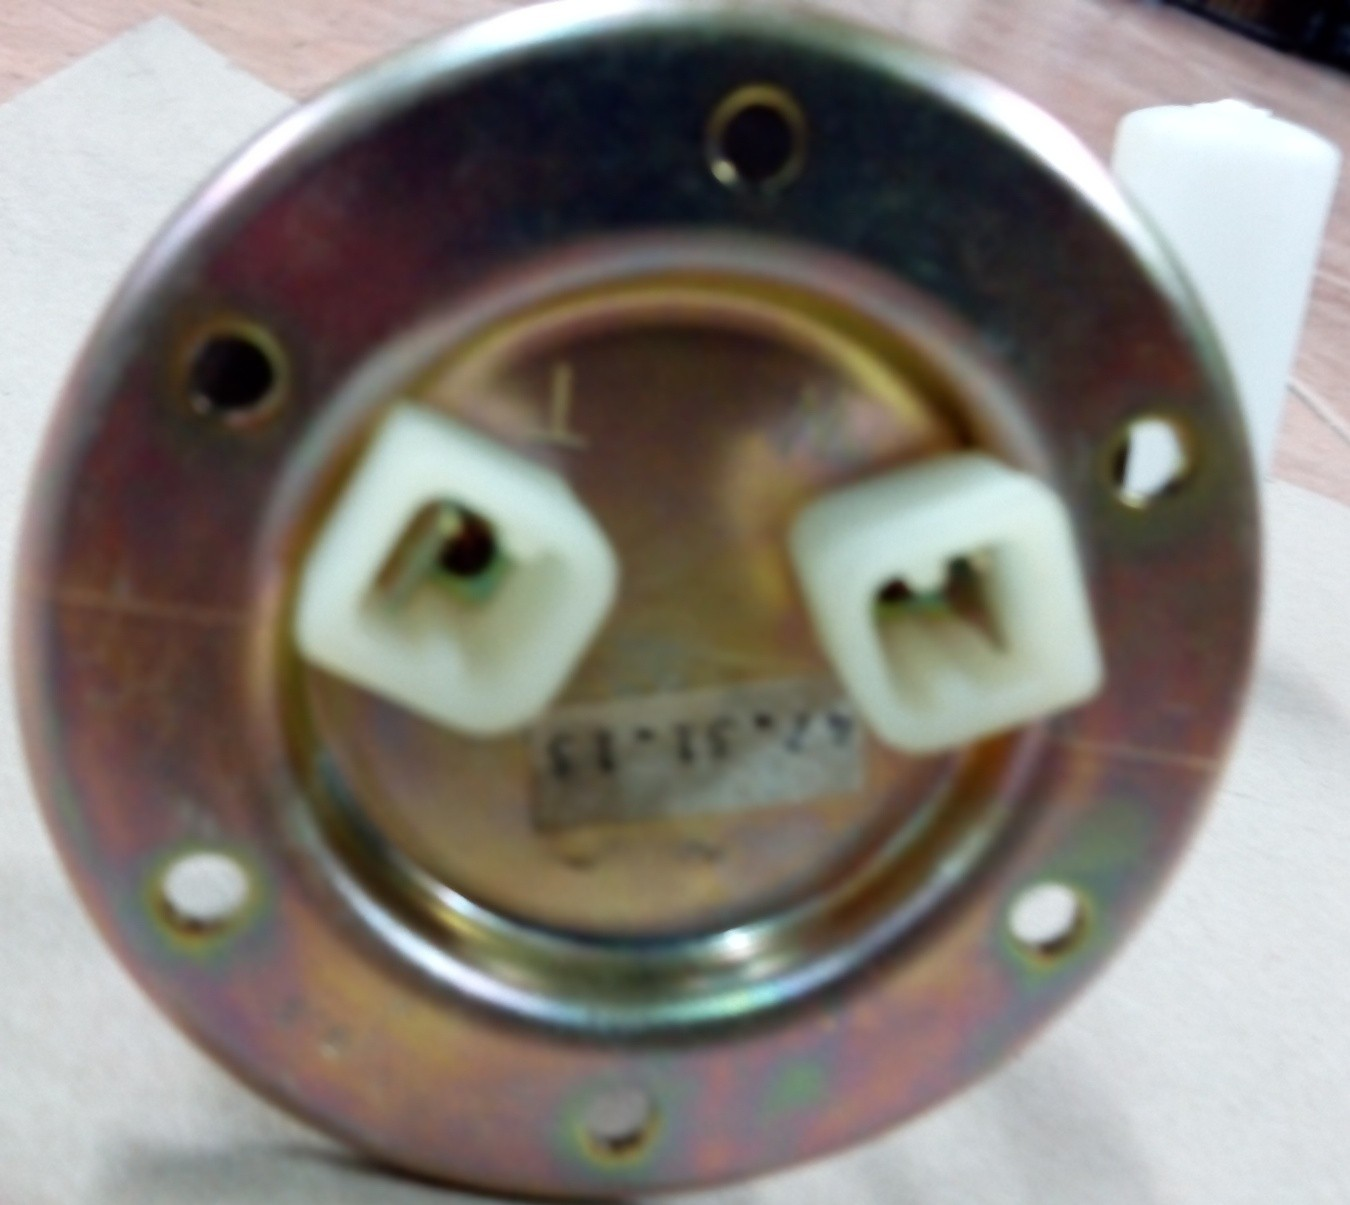 AFORADOR AVIA GI MOD. 1250 GI 5103